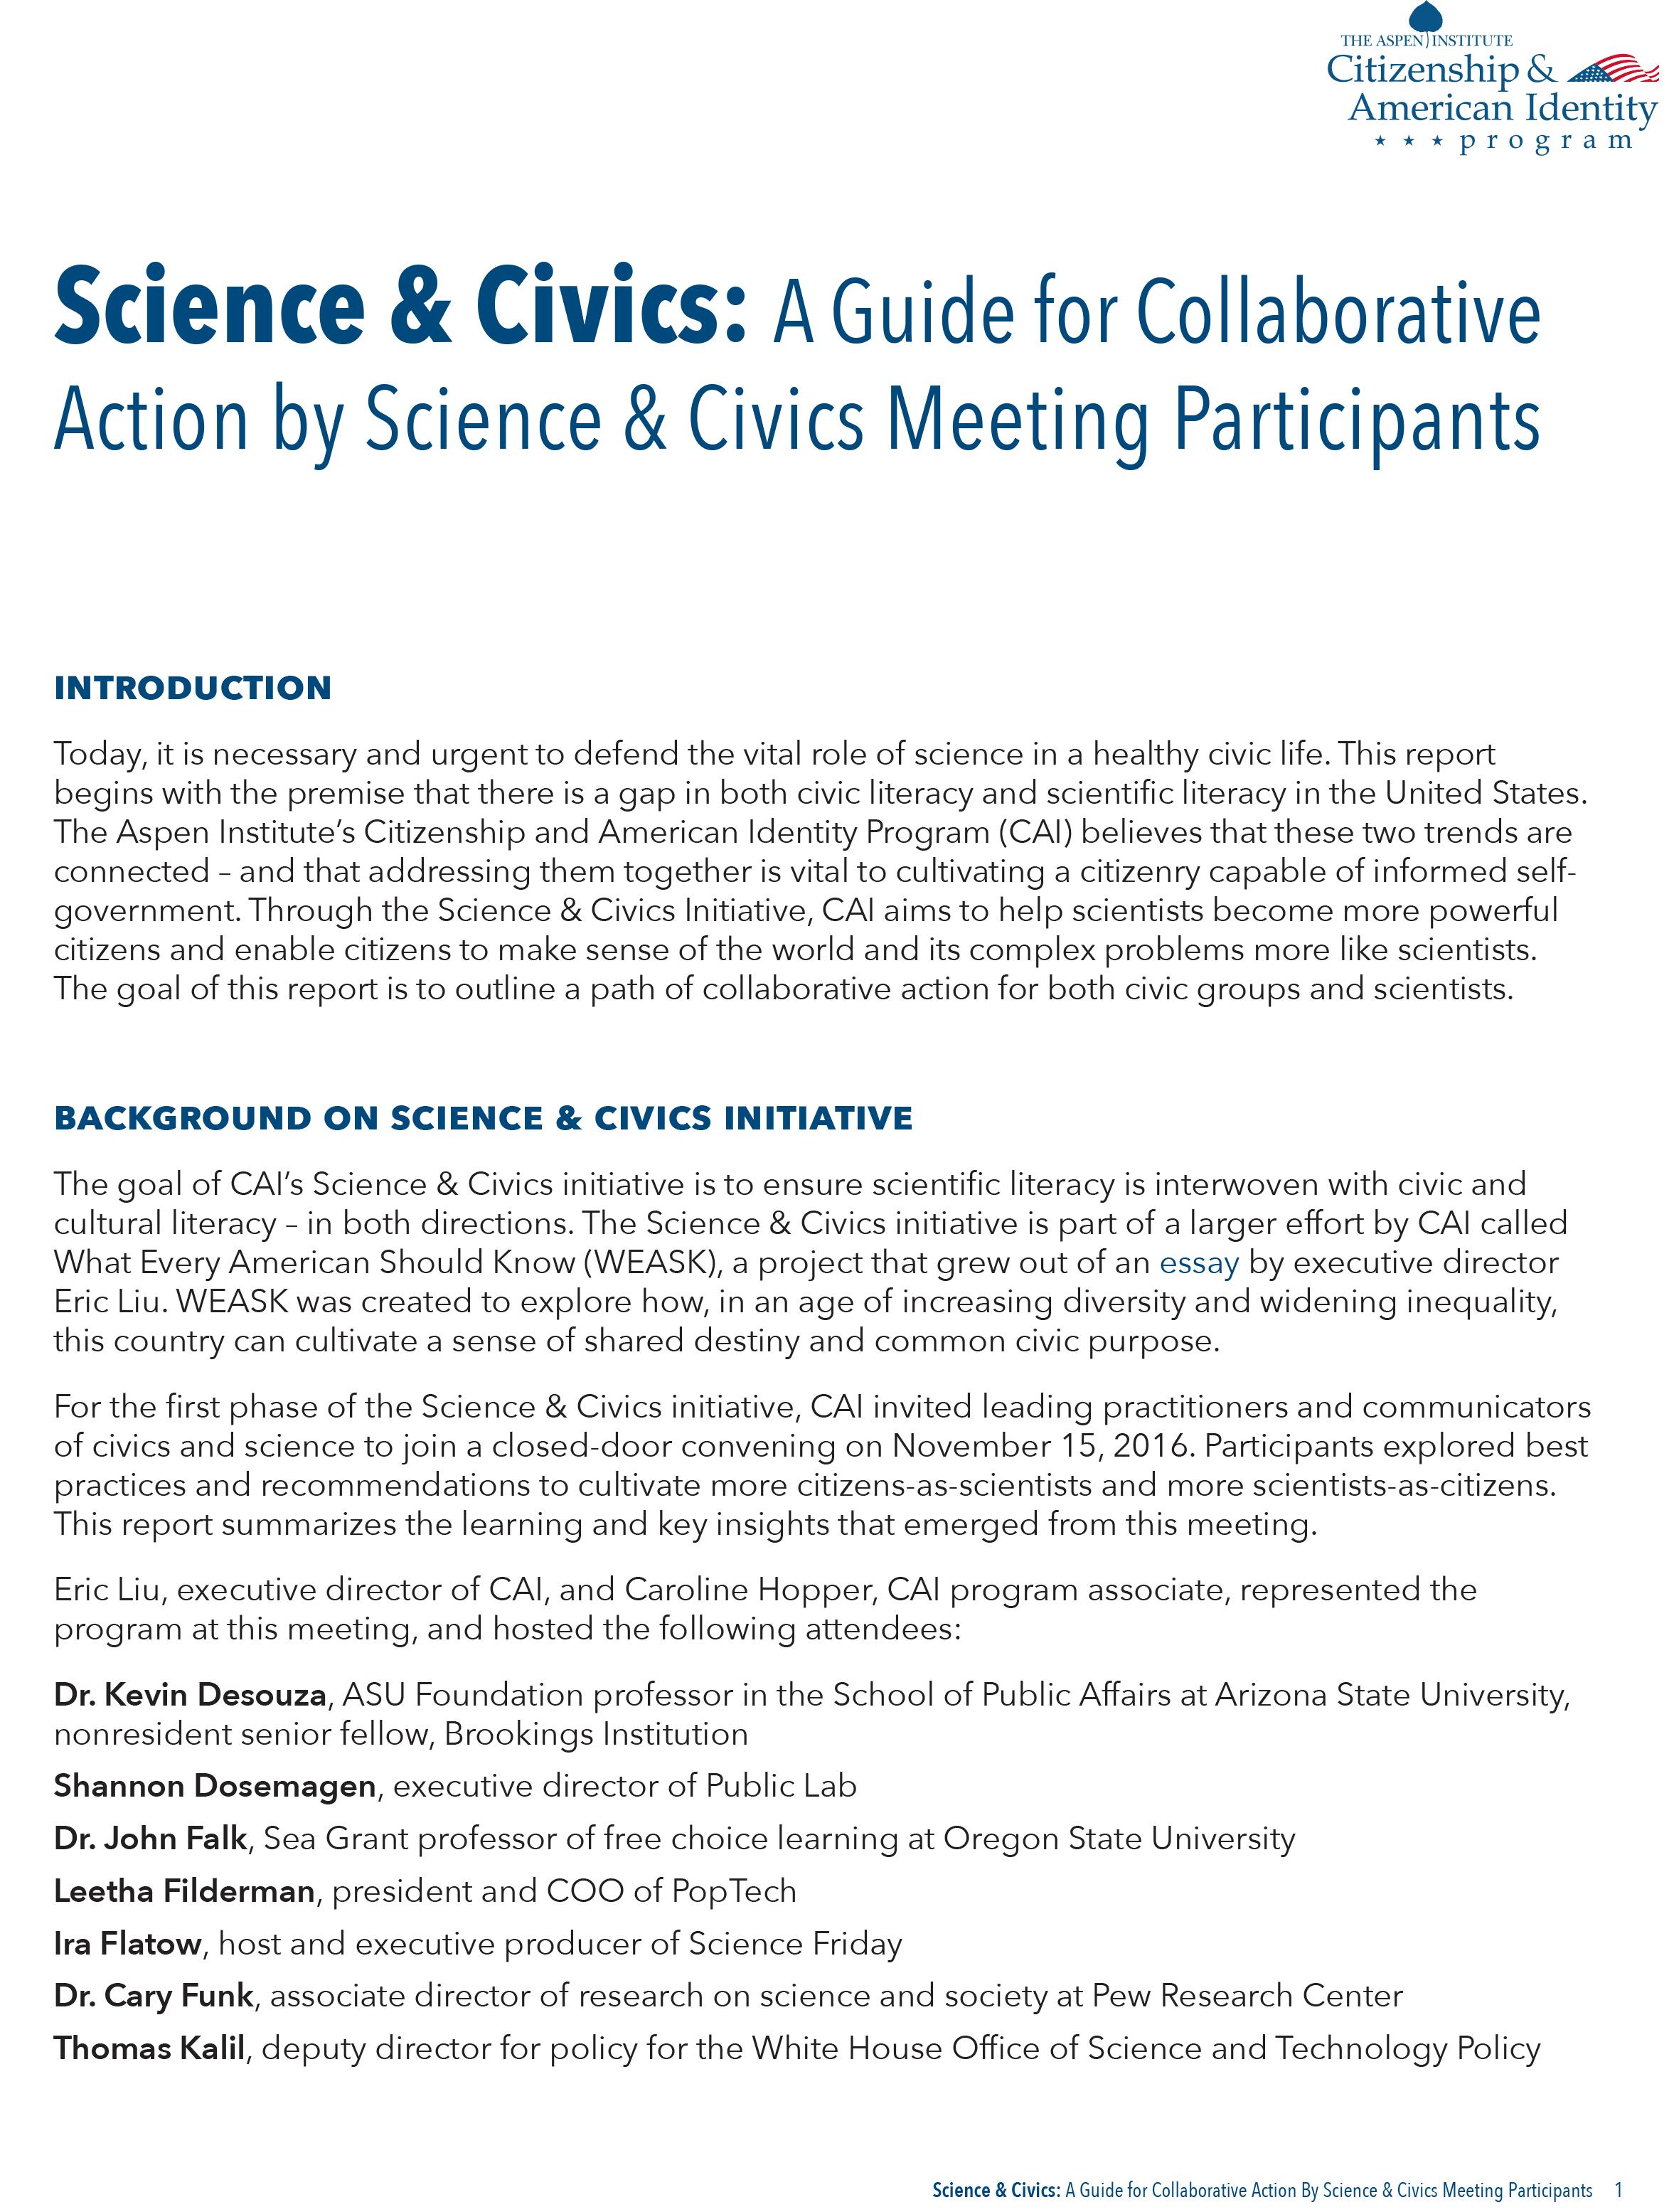 Science & Civics Guide